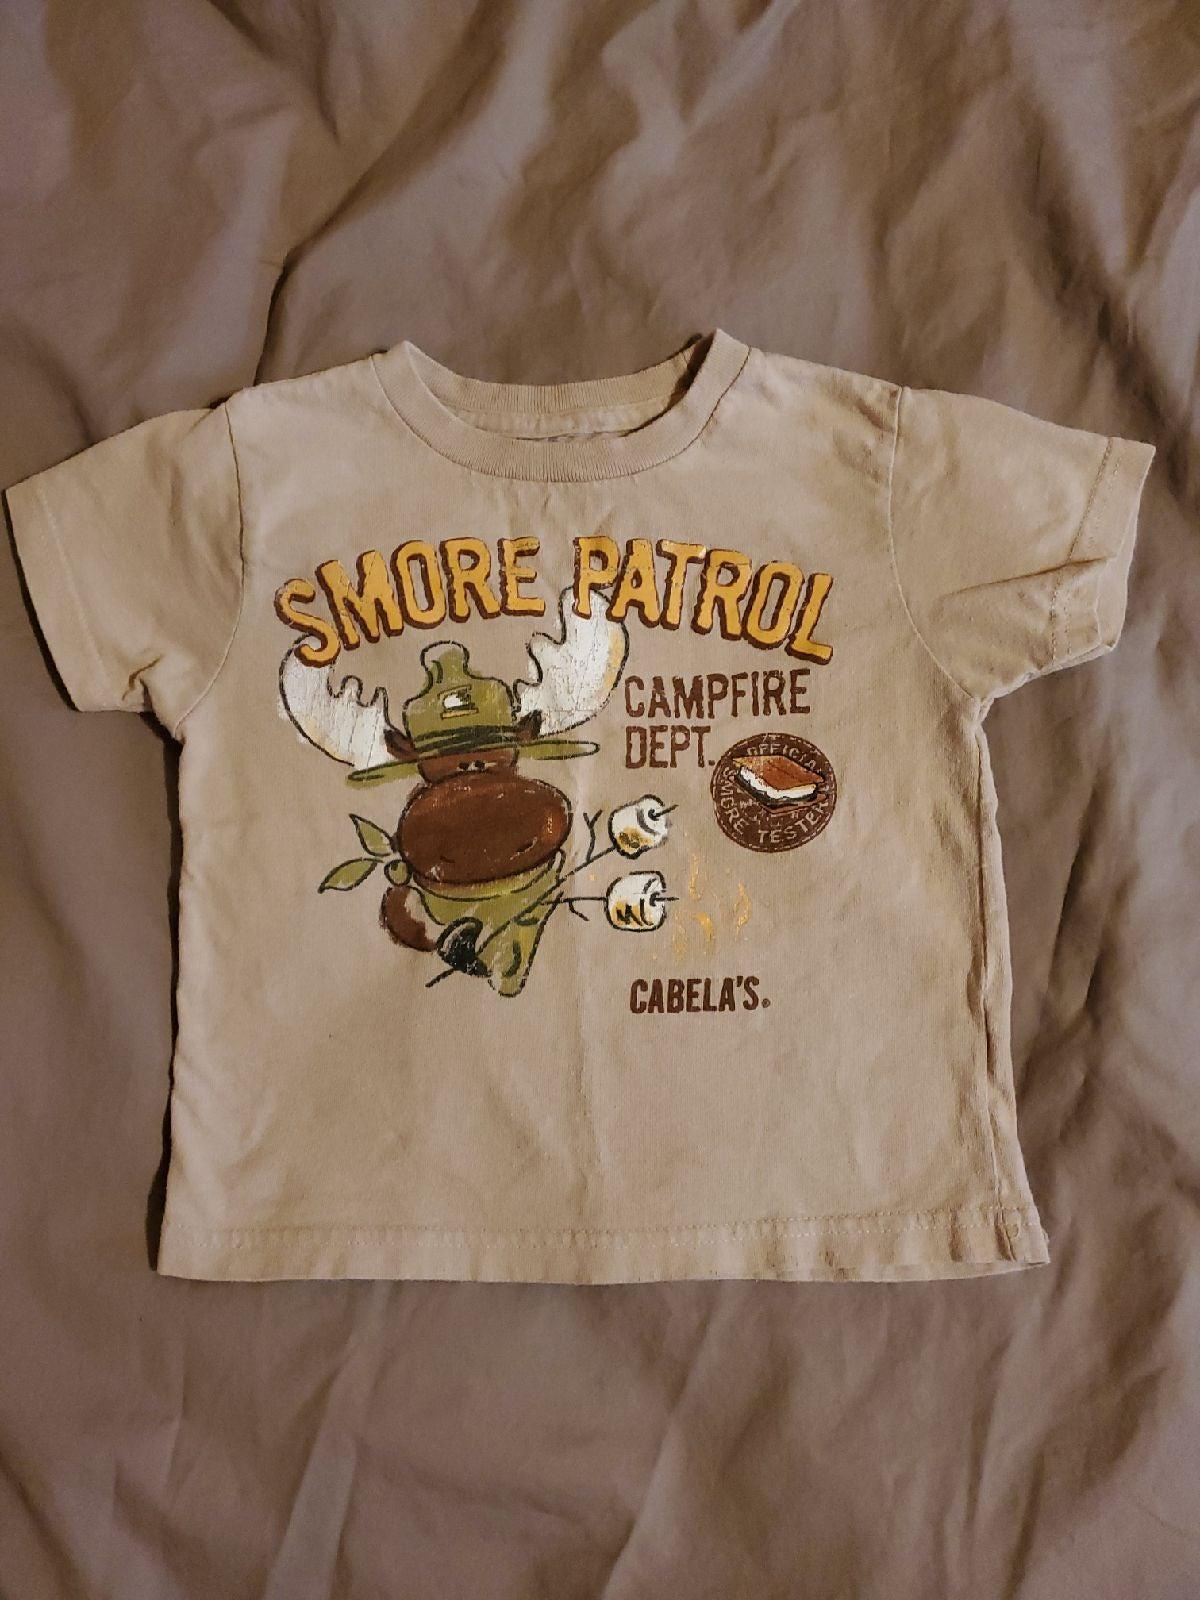 4t cabelas camping Shirt